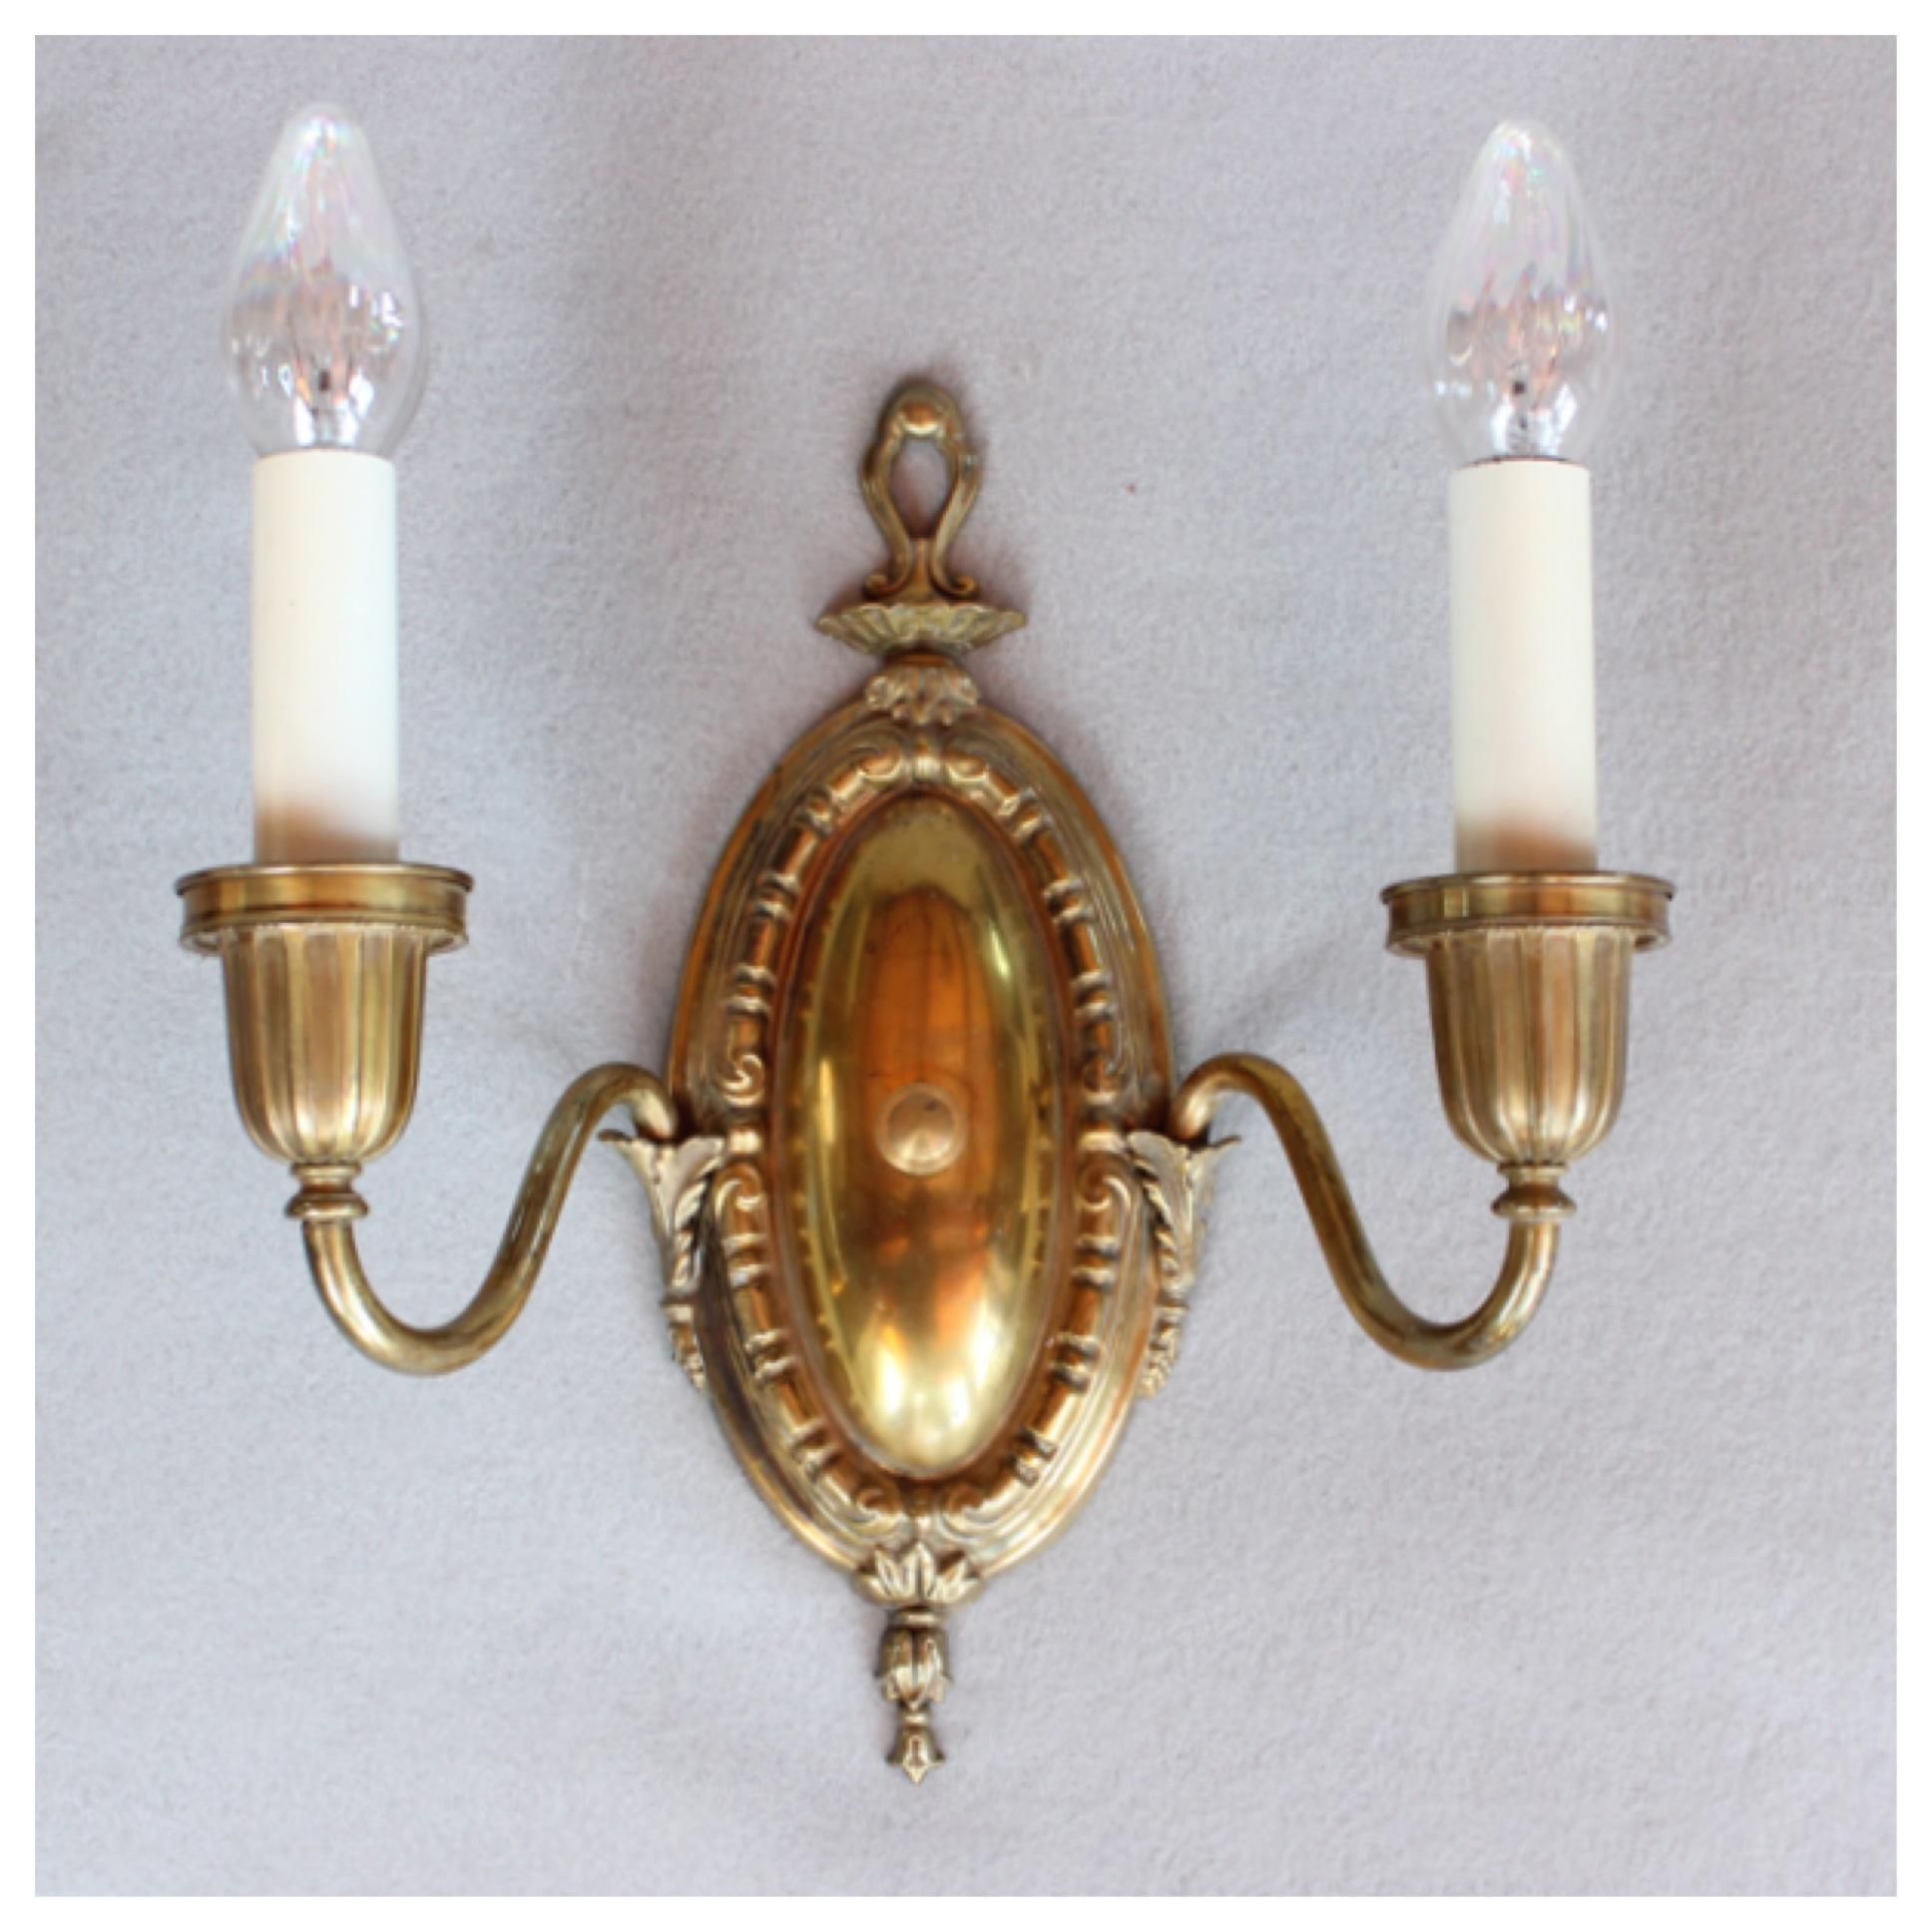 A5015 set of 4 wall sconces bogart bremmer bradley for Arts and crafts candle sconces